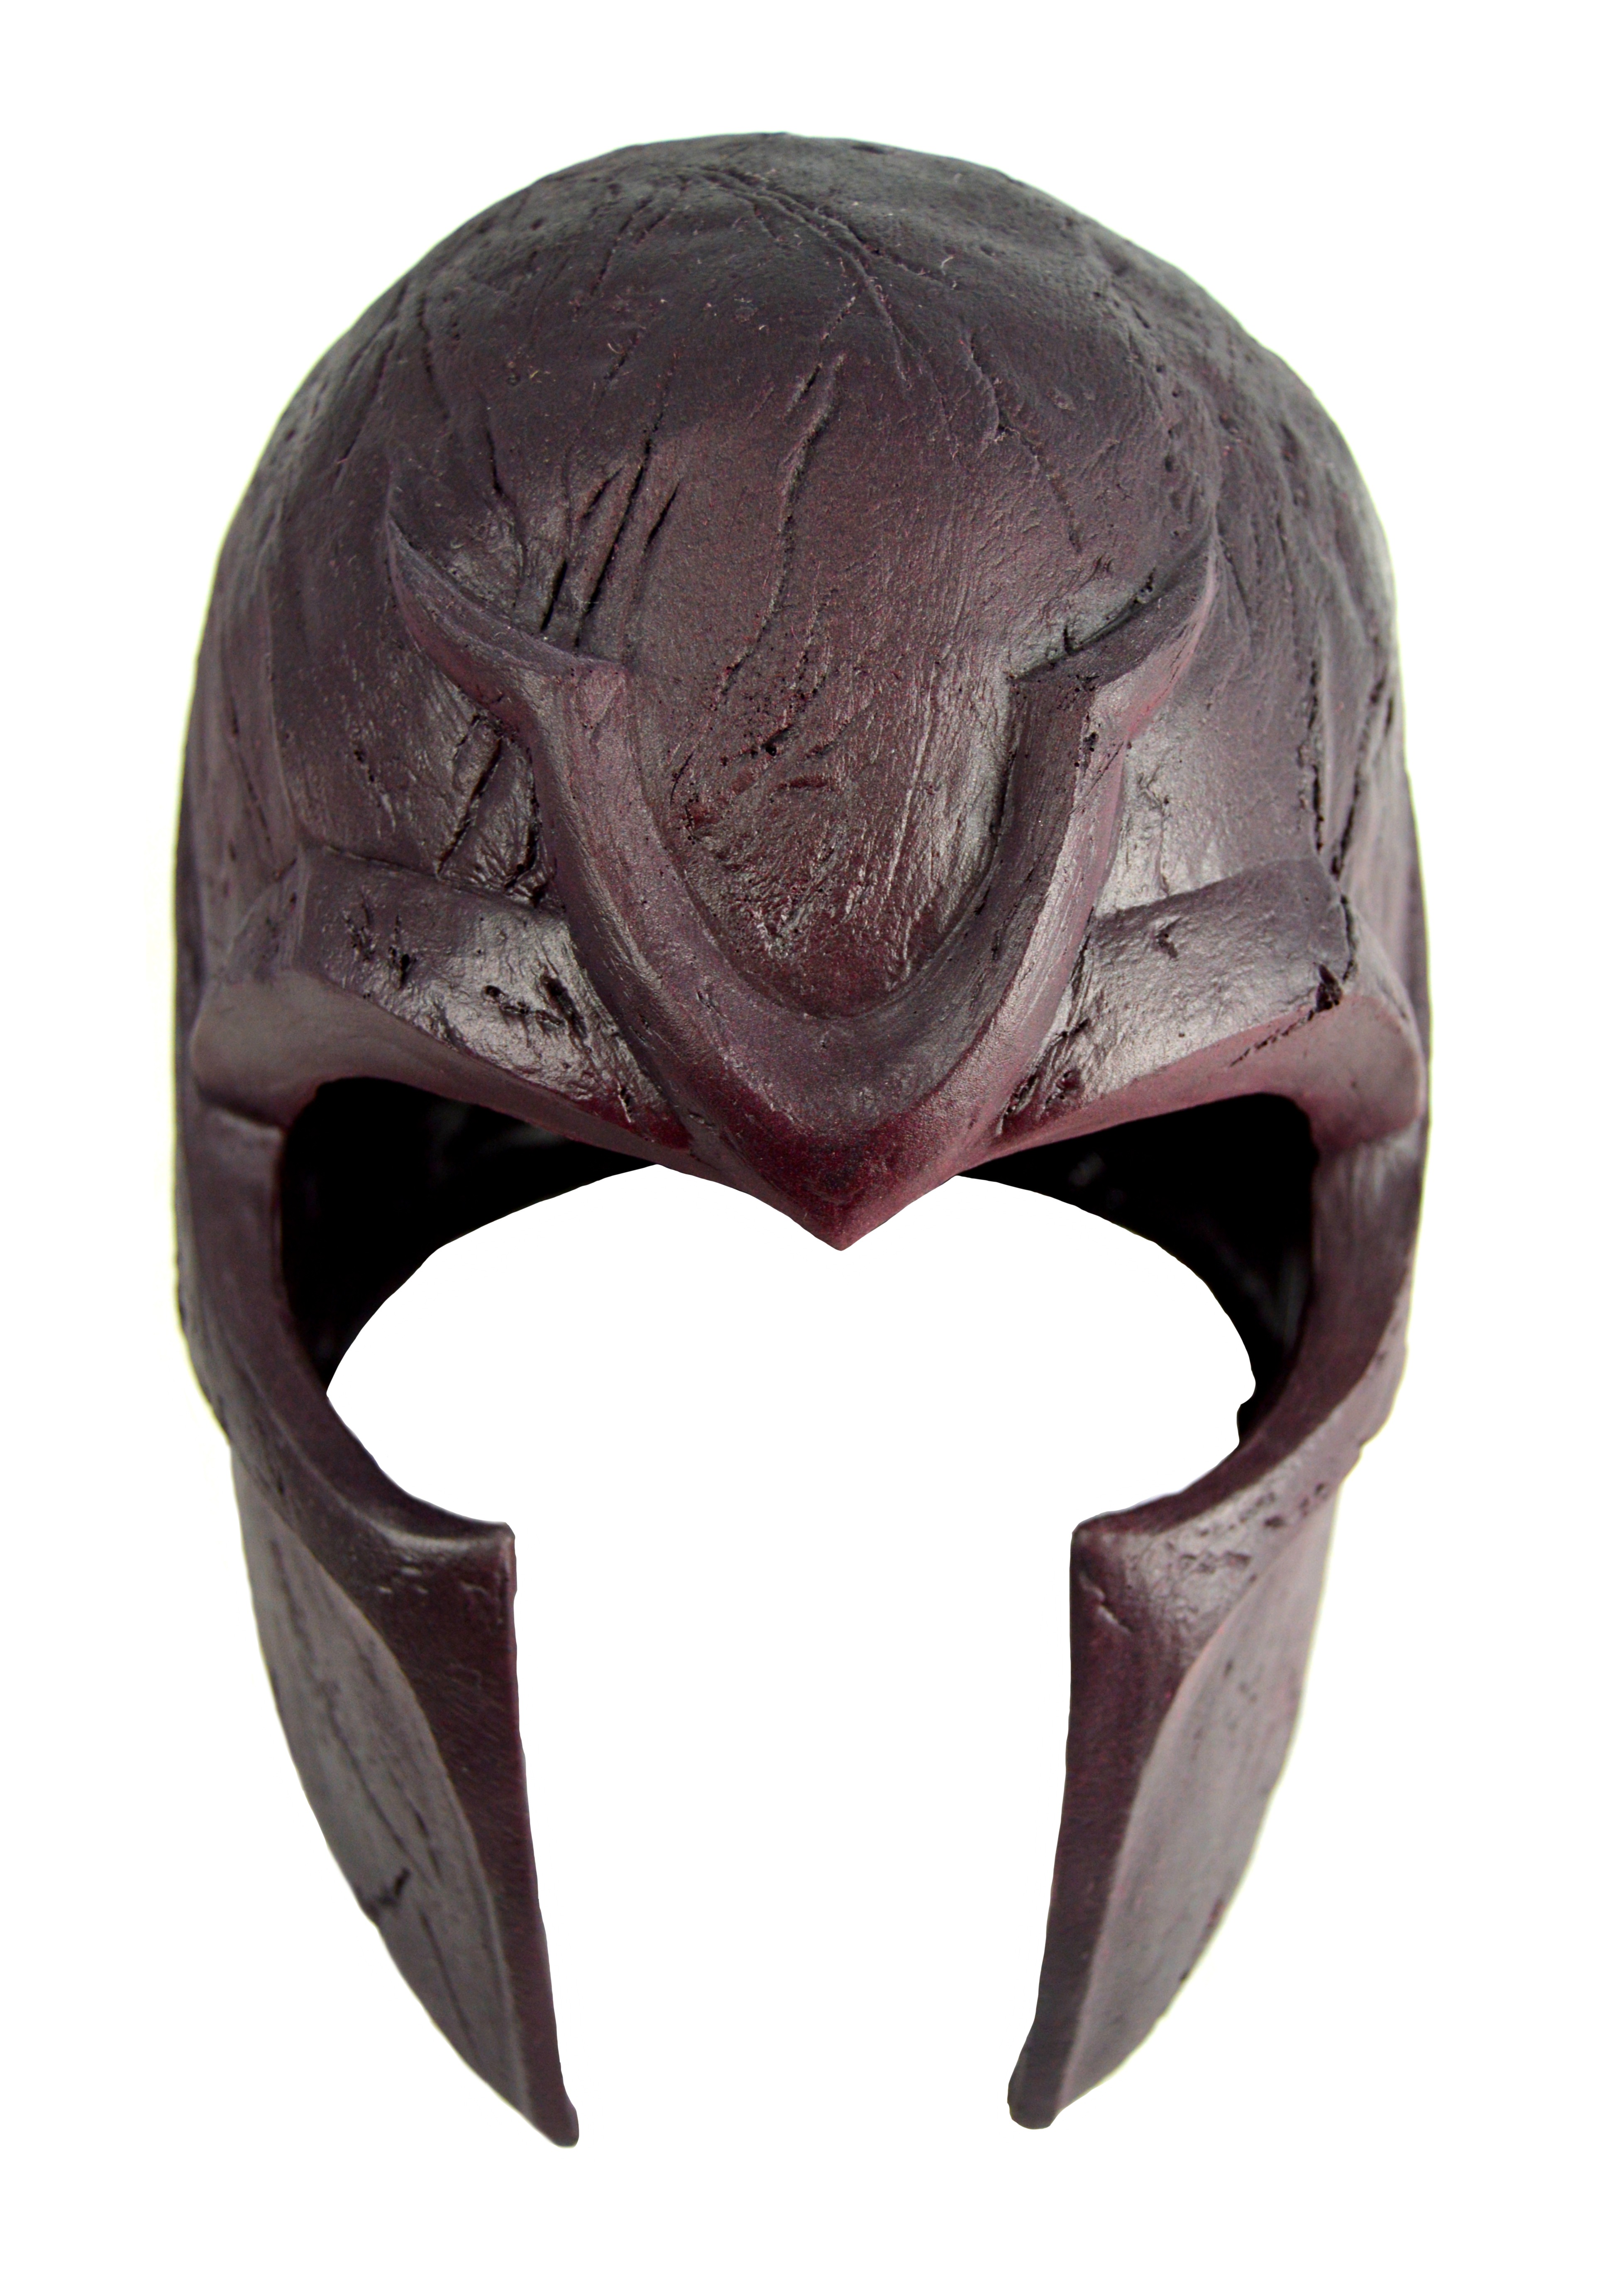 X-Men Days of Future Past Magneto Helmet · Gotham City FX ...